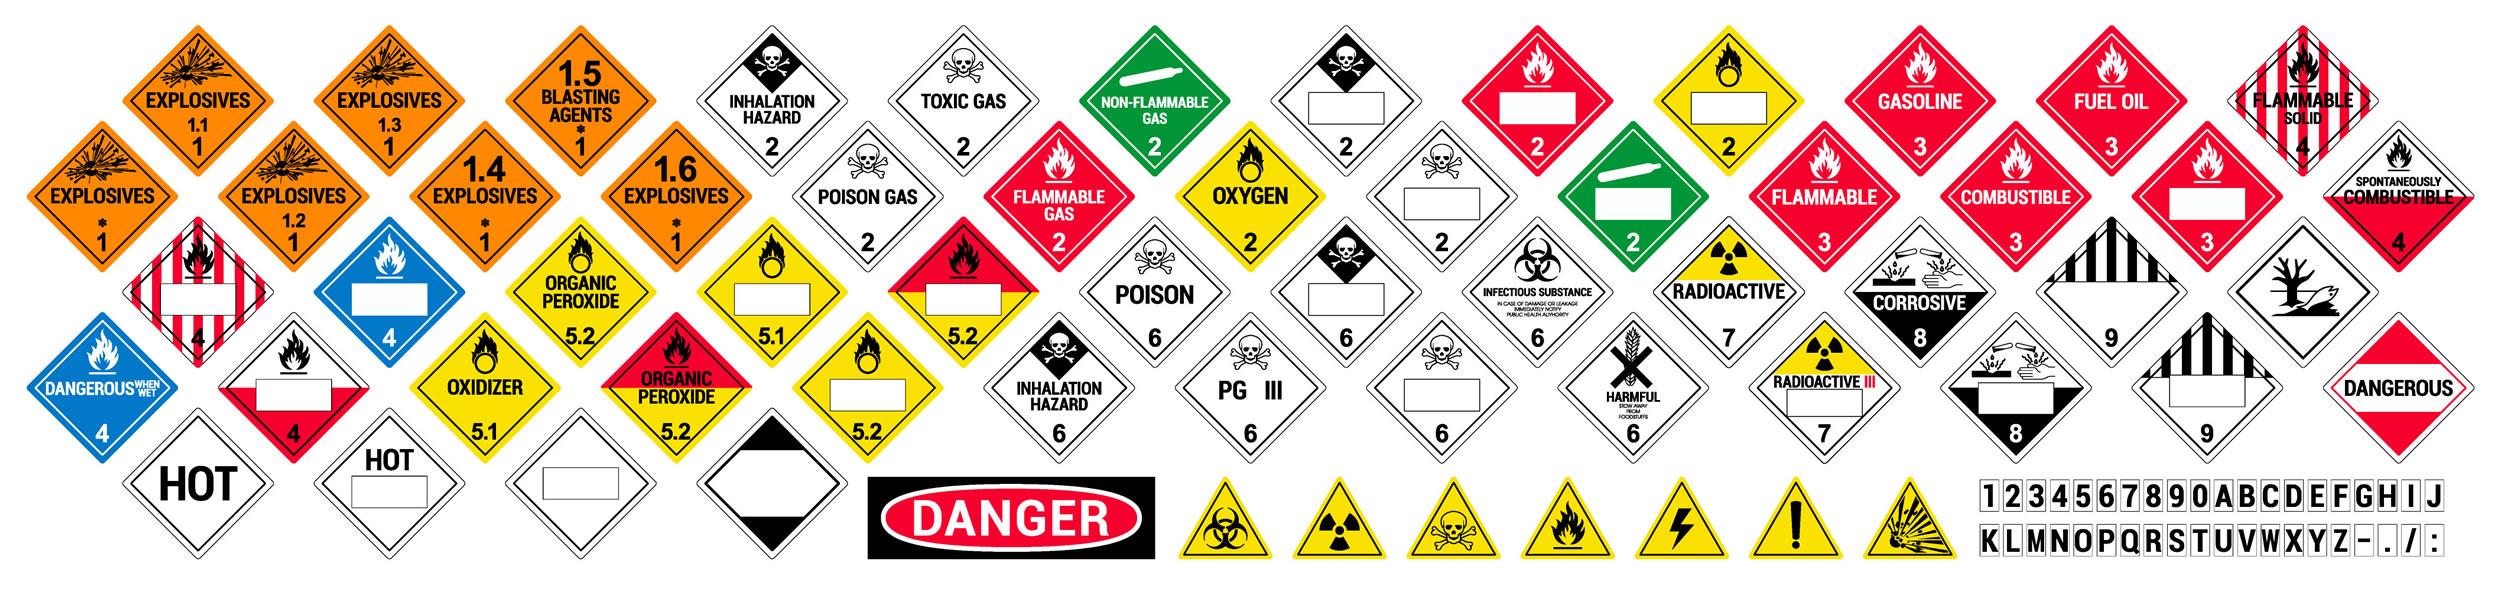 OSHA 2015 – Hazardous Materials